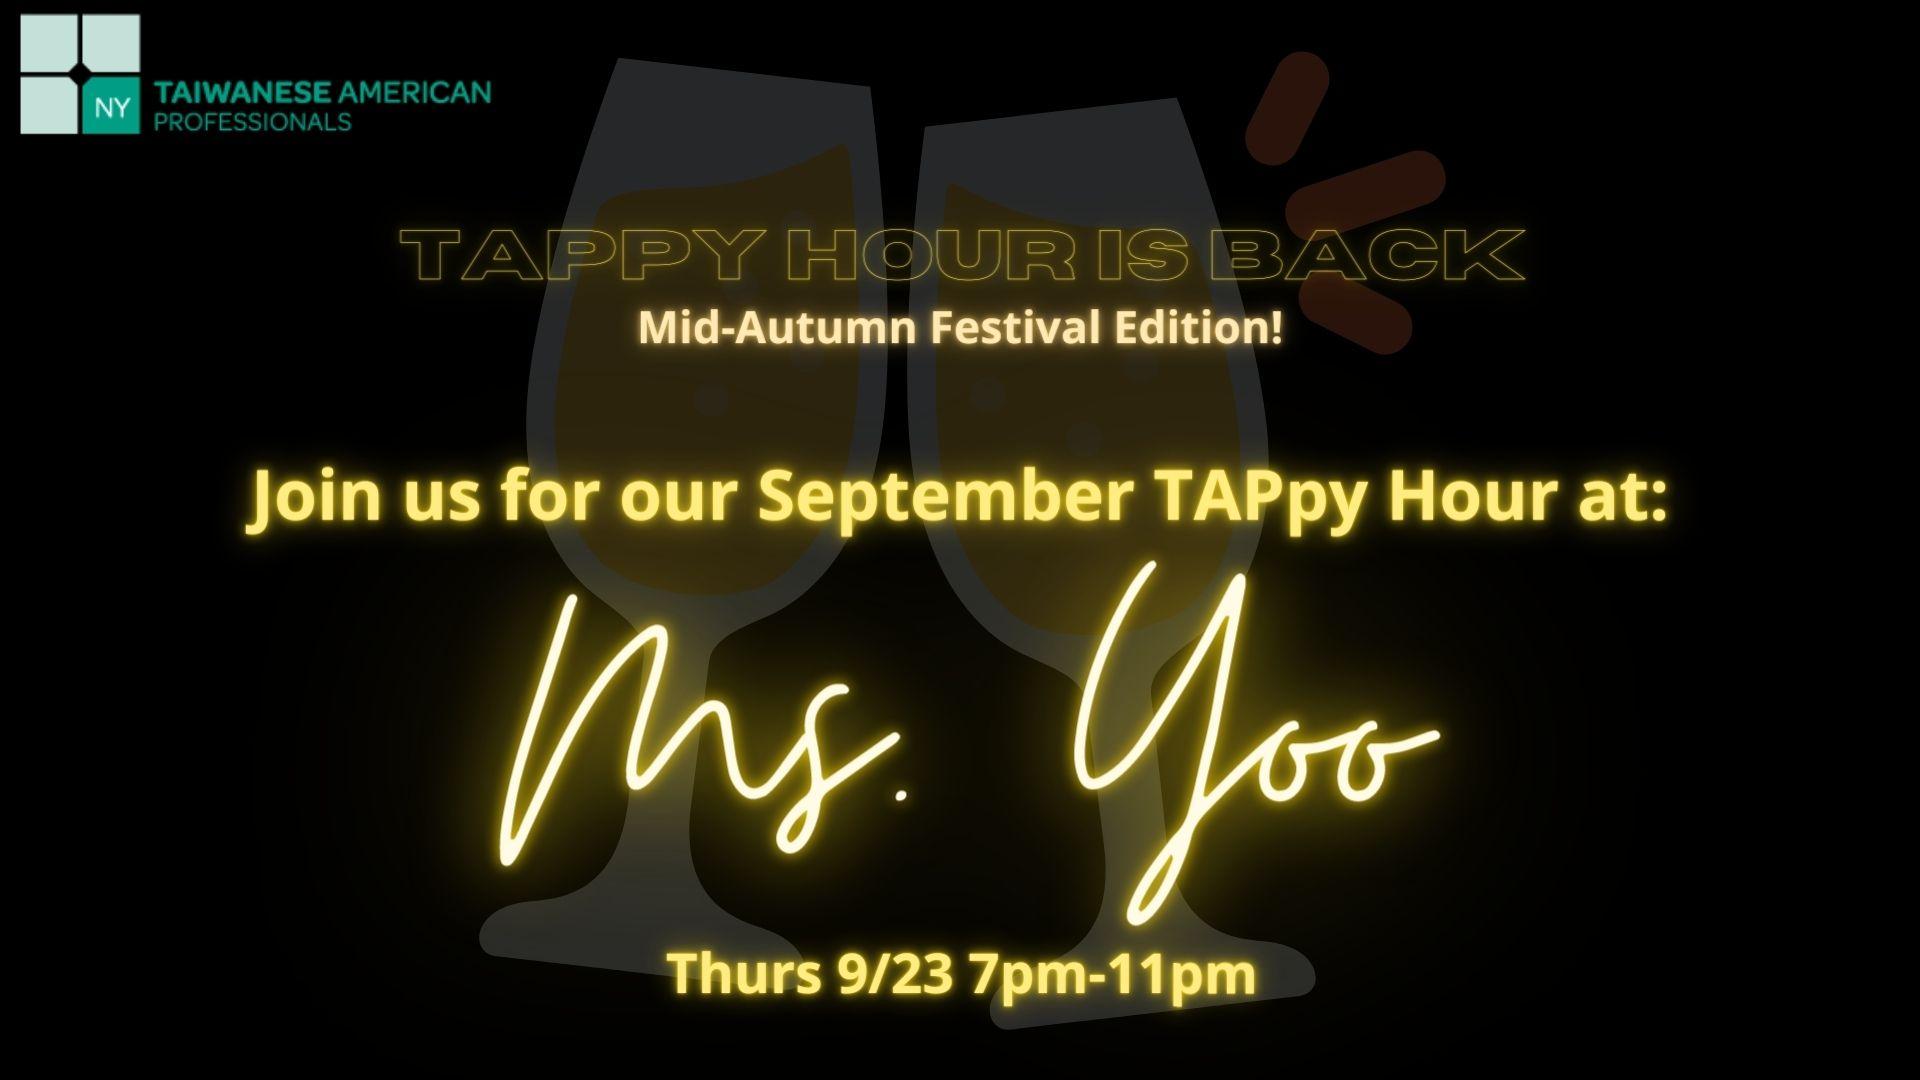 September TAPpy Hour 2021